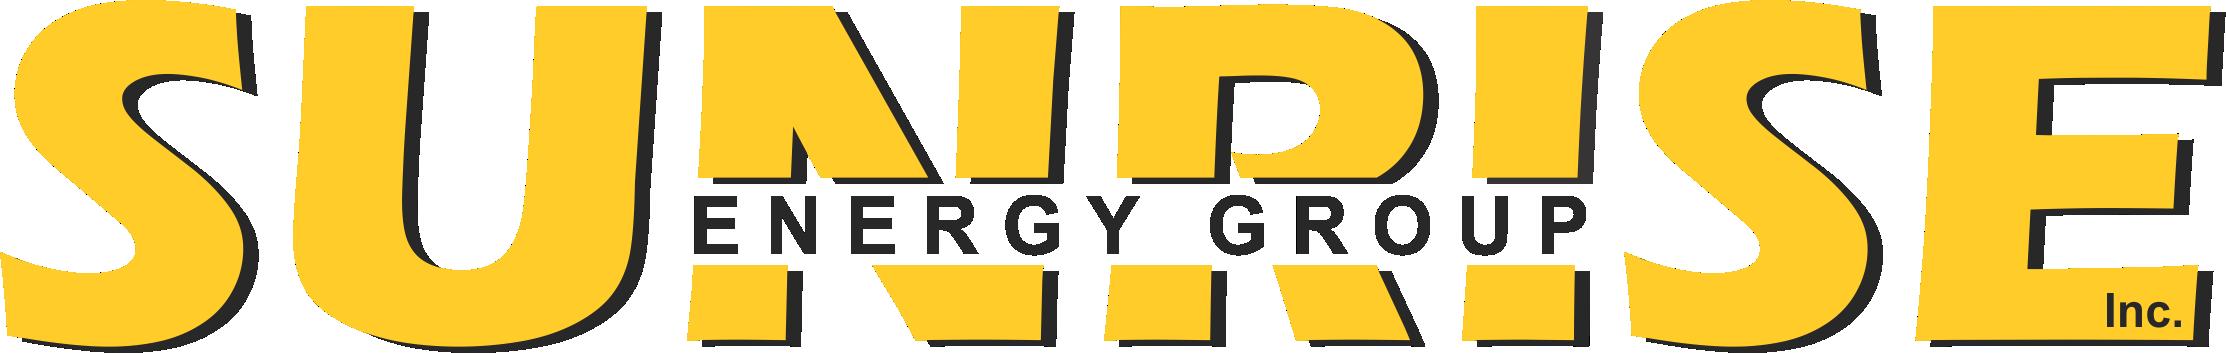 Sunrise Energy Group Inc Let The Sunrise Power Your Home